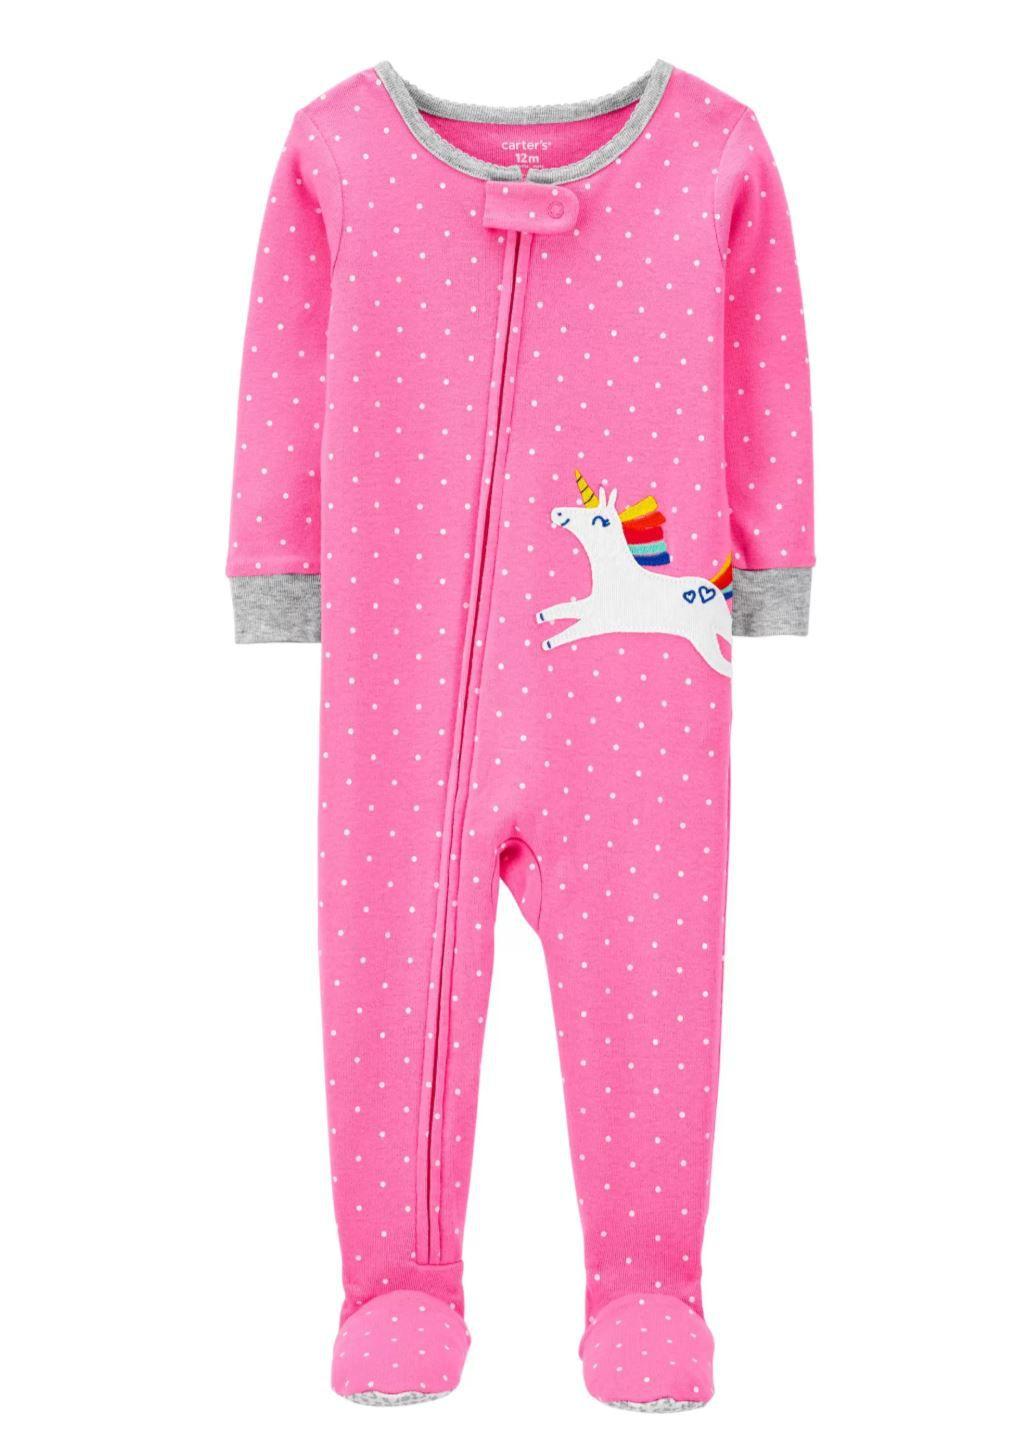 Macacão Malha Menina Unicórnio Pink - Carters